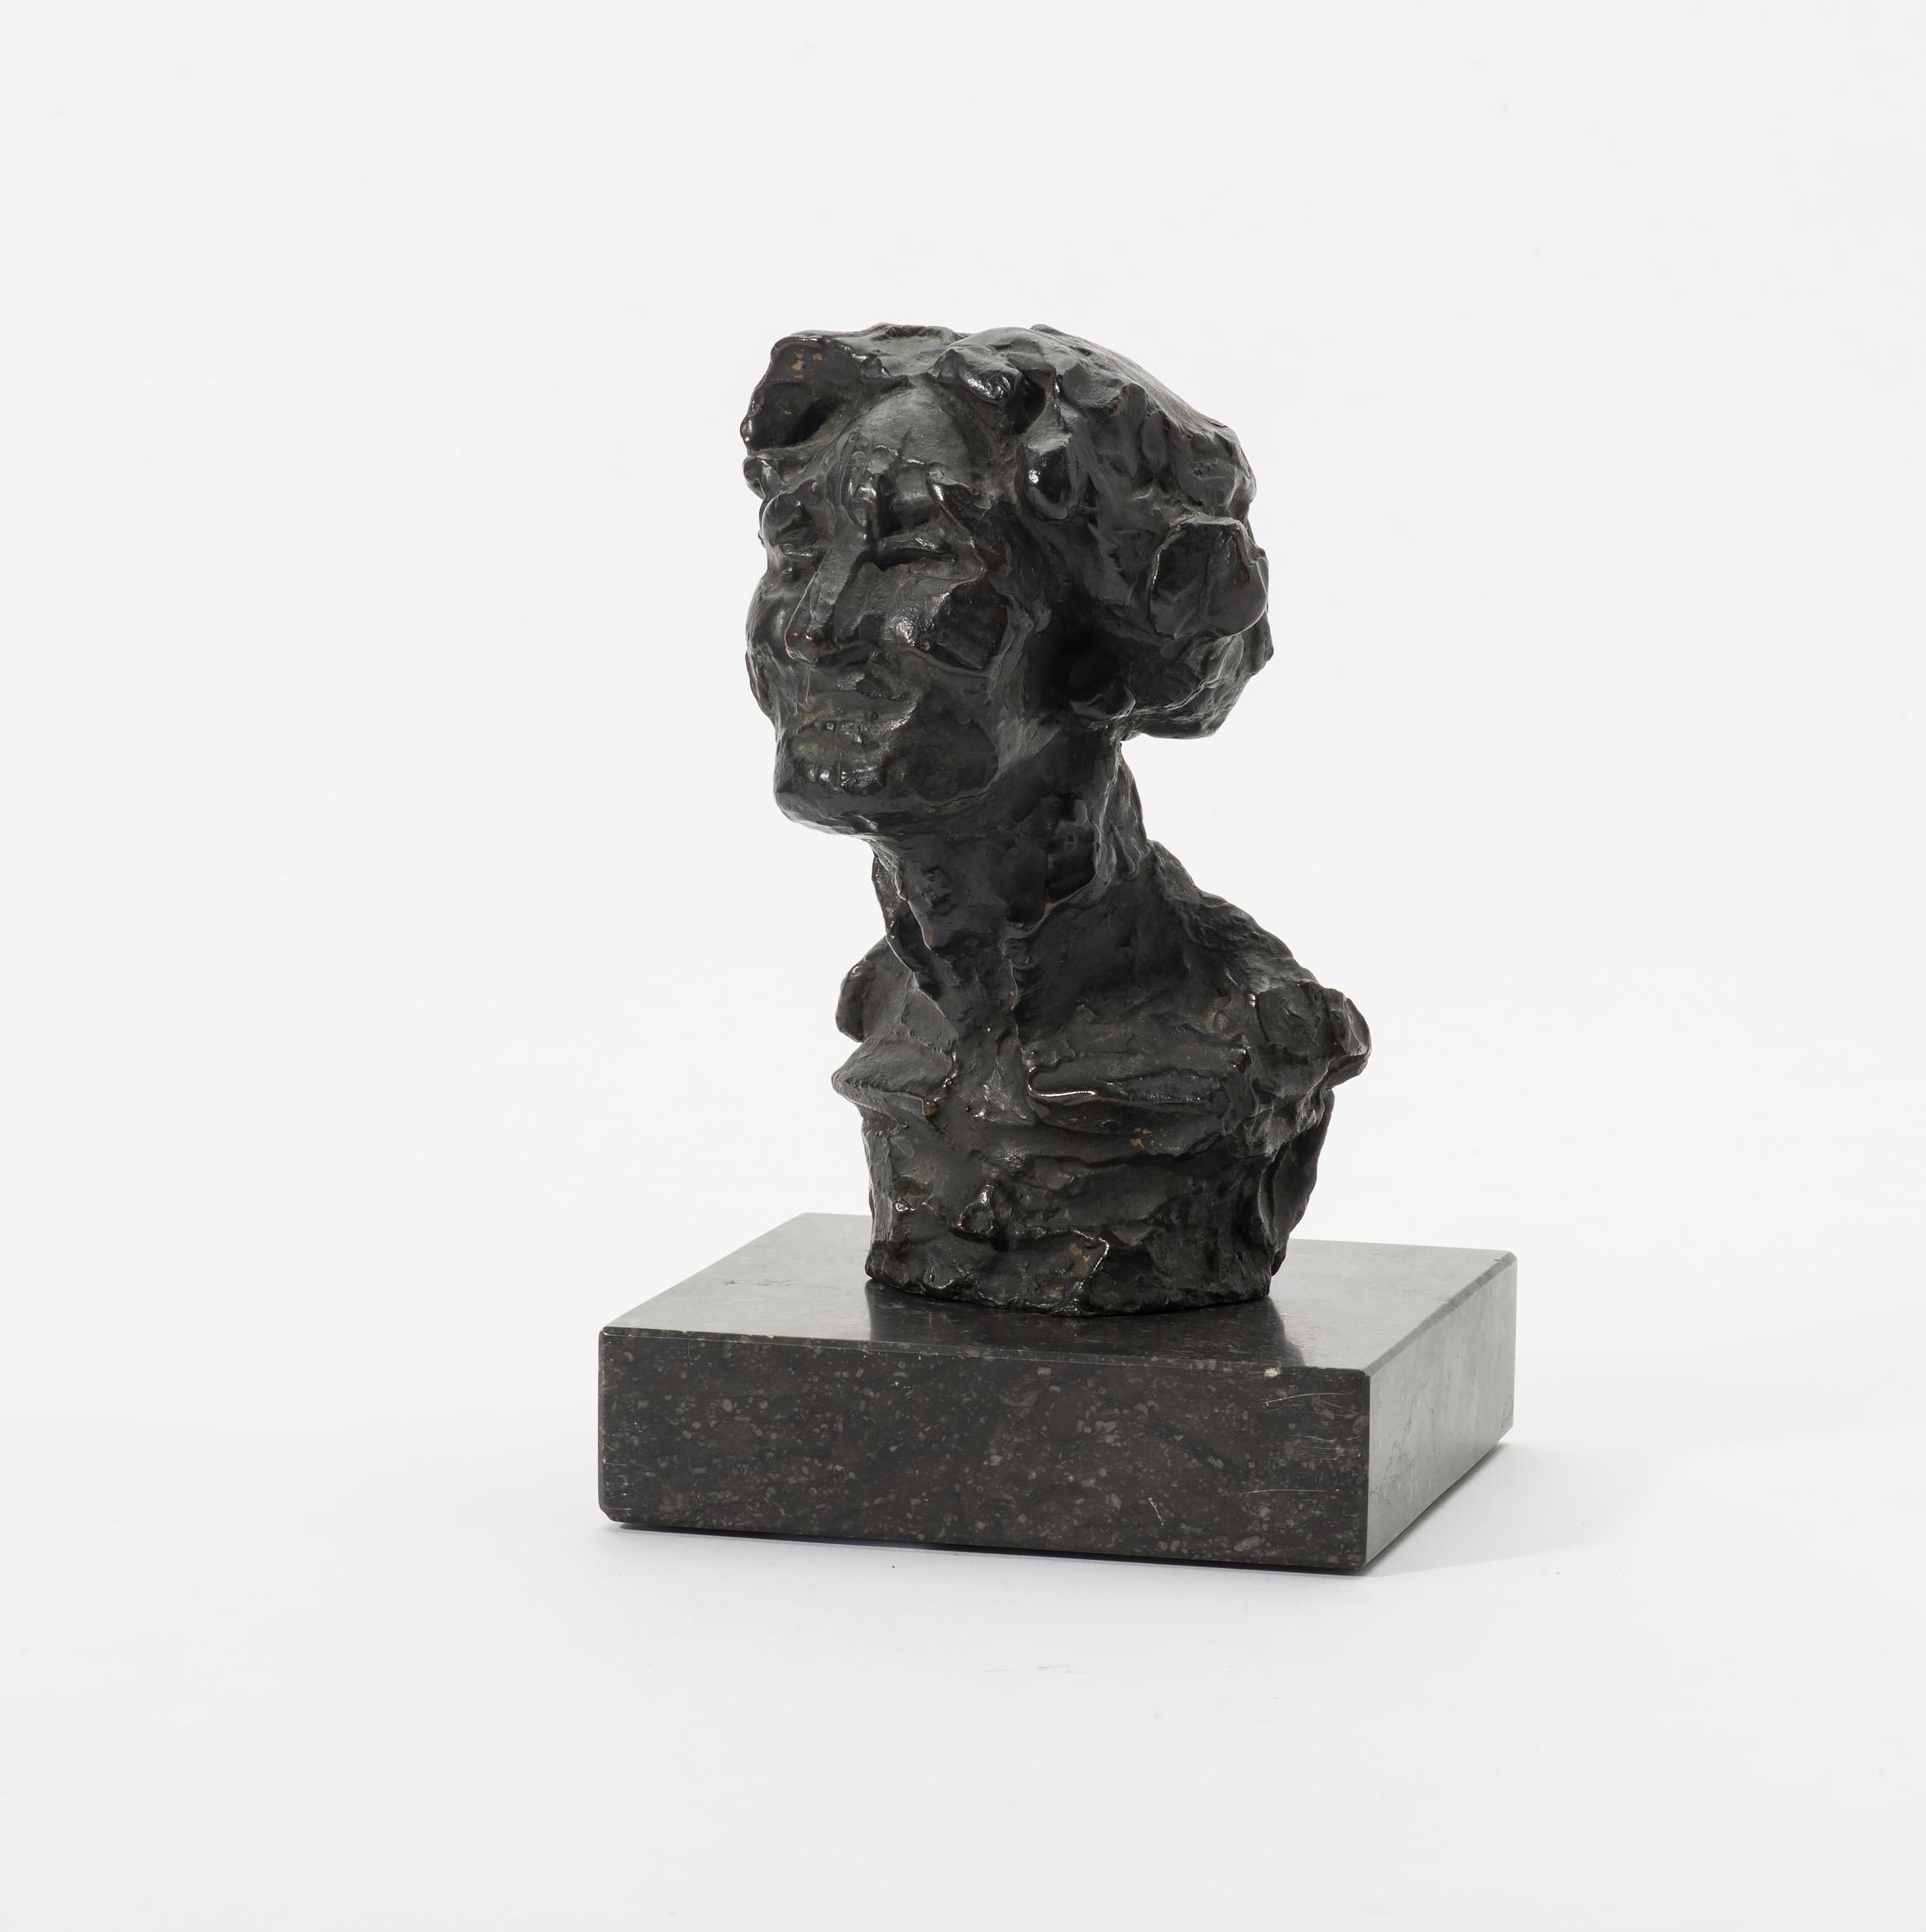 Klein Portret Van Mevrouw Duintjer (1959)